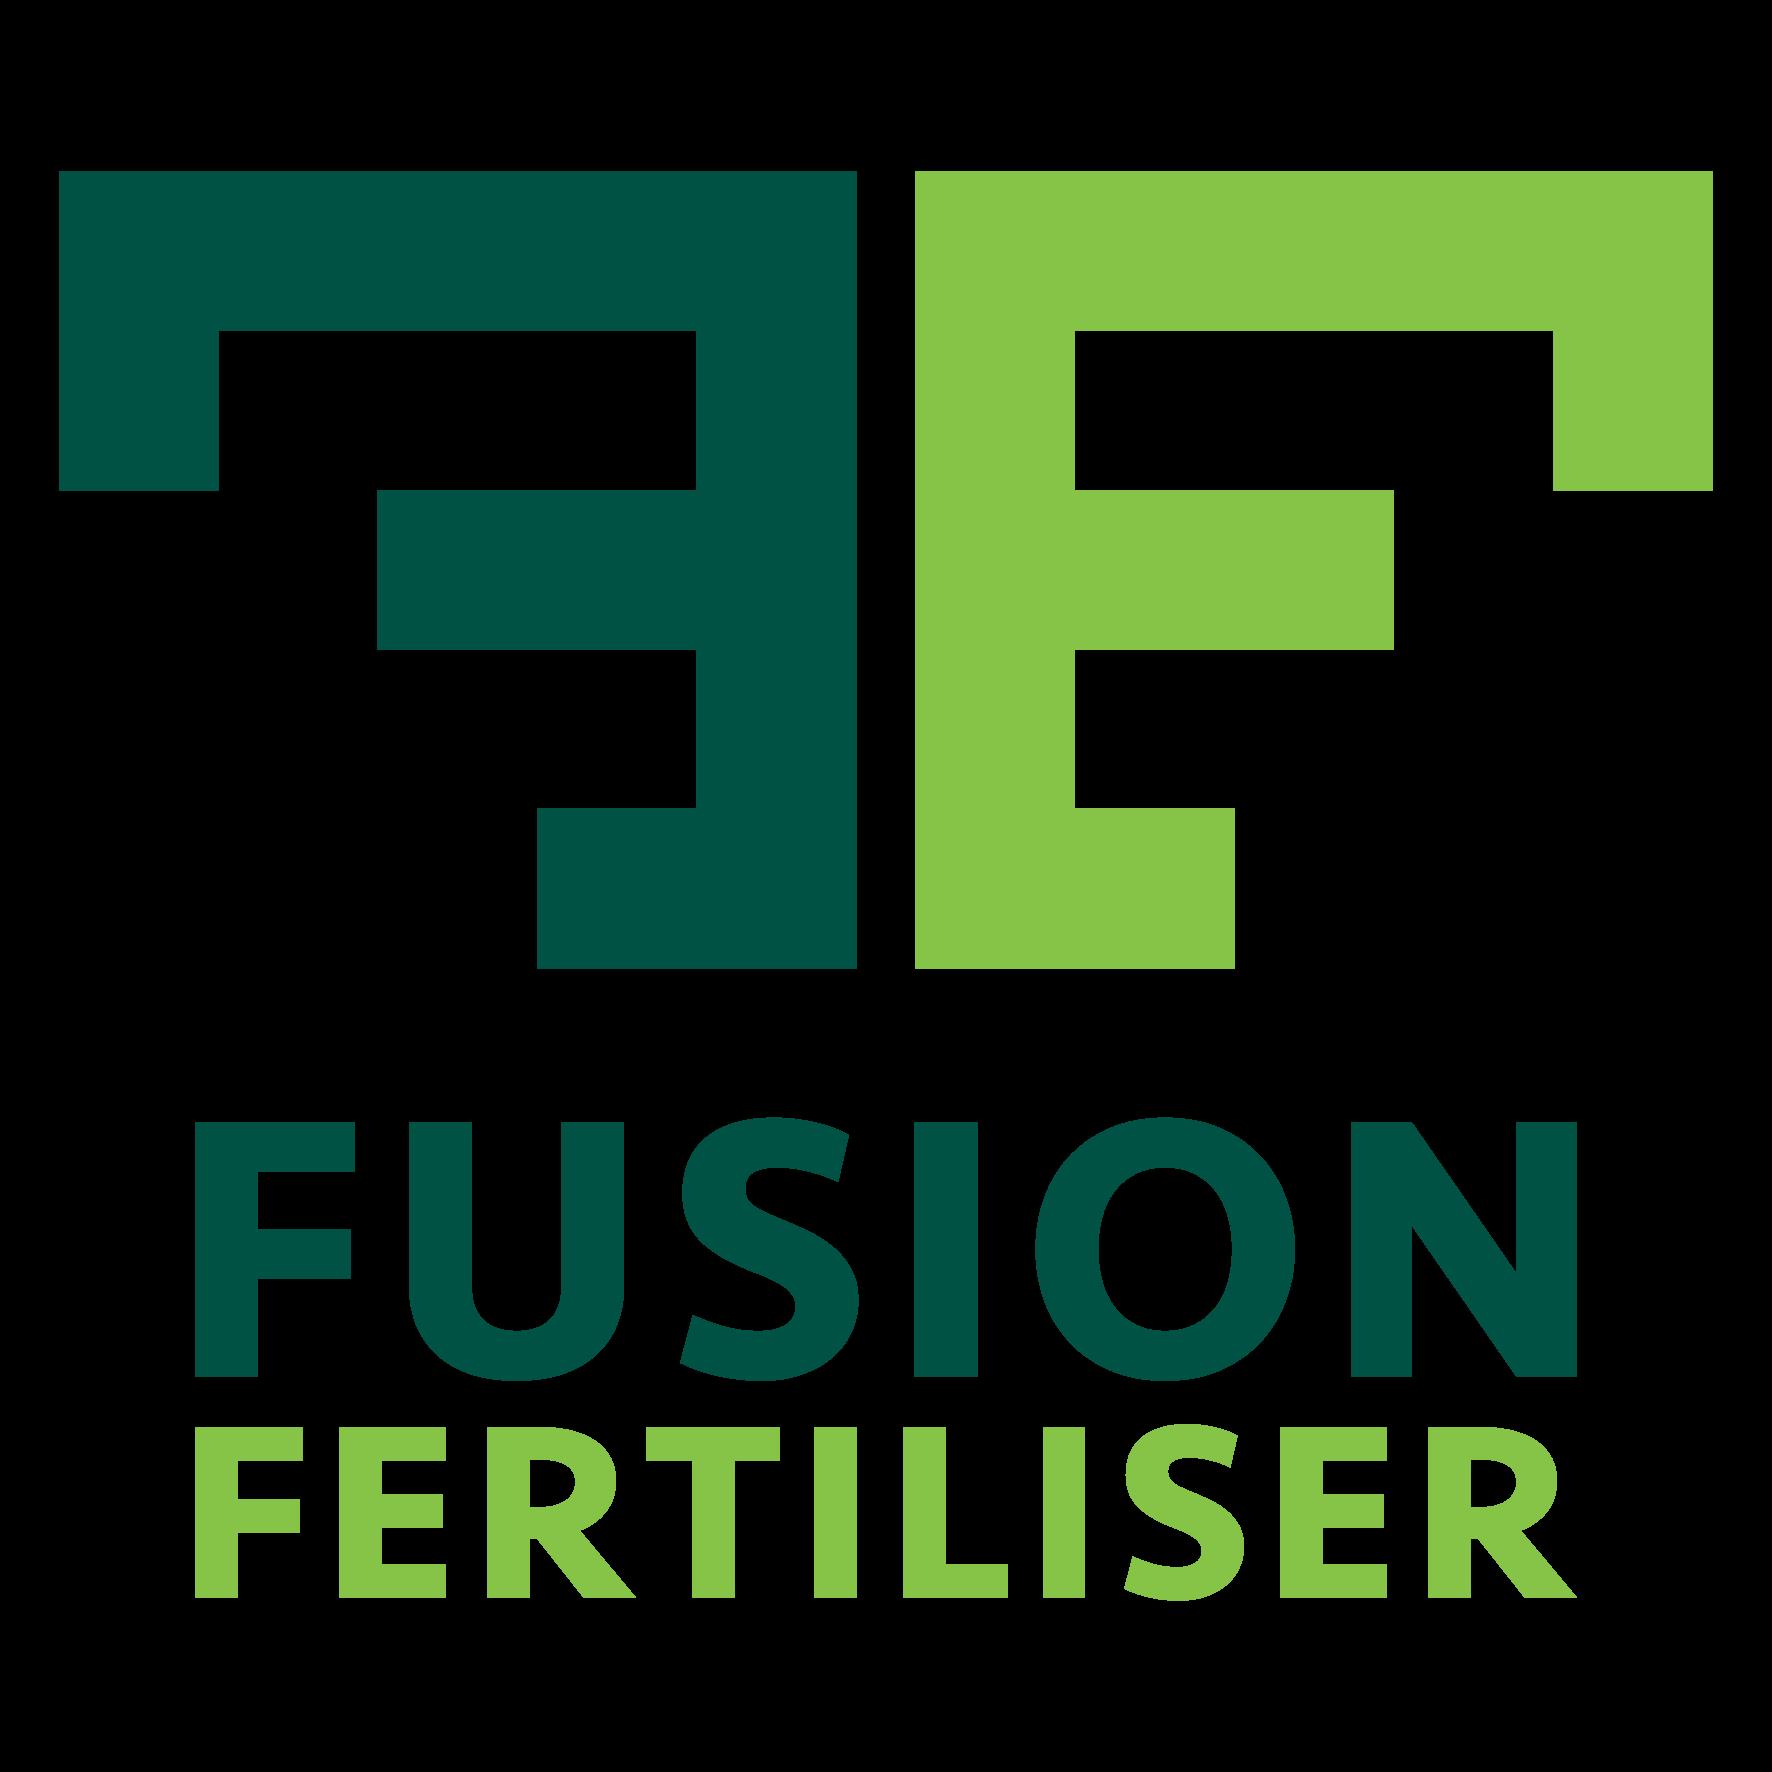 Fusion Fertiliser